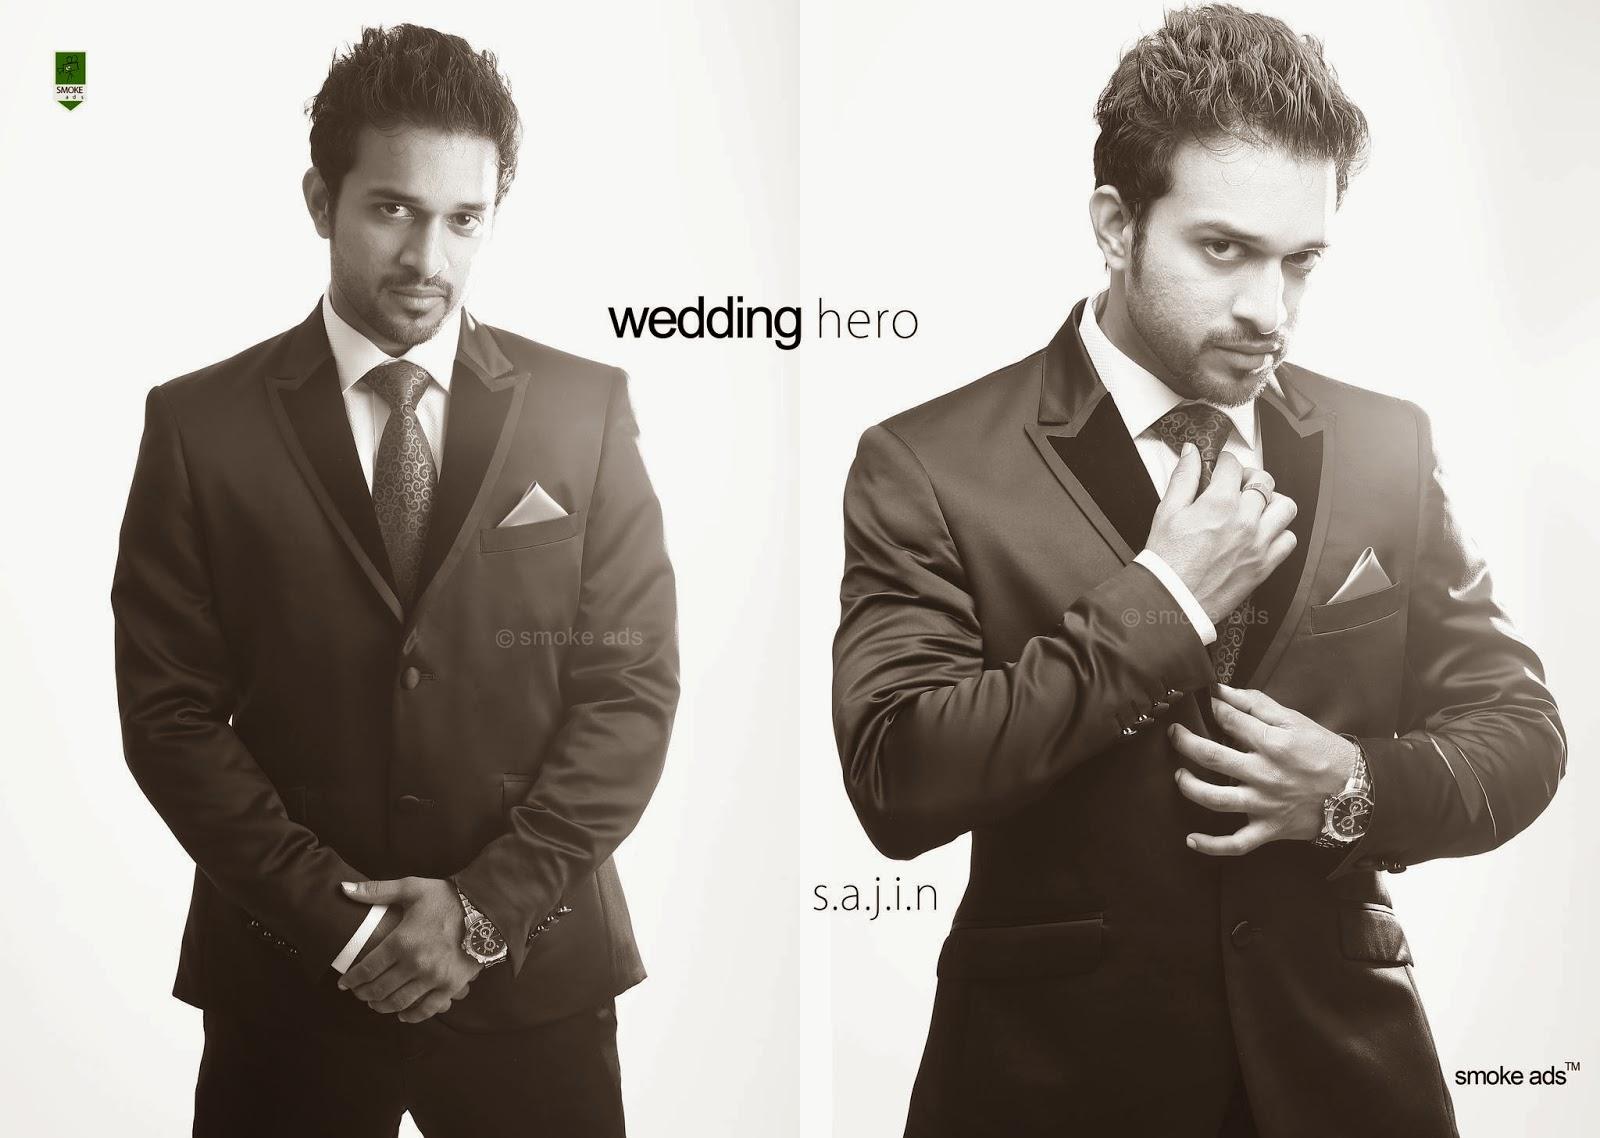 actress shafna wedding gallery woodstimescom leads to